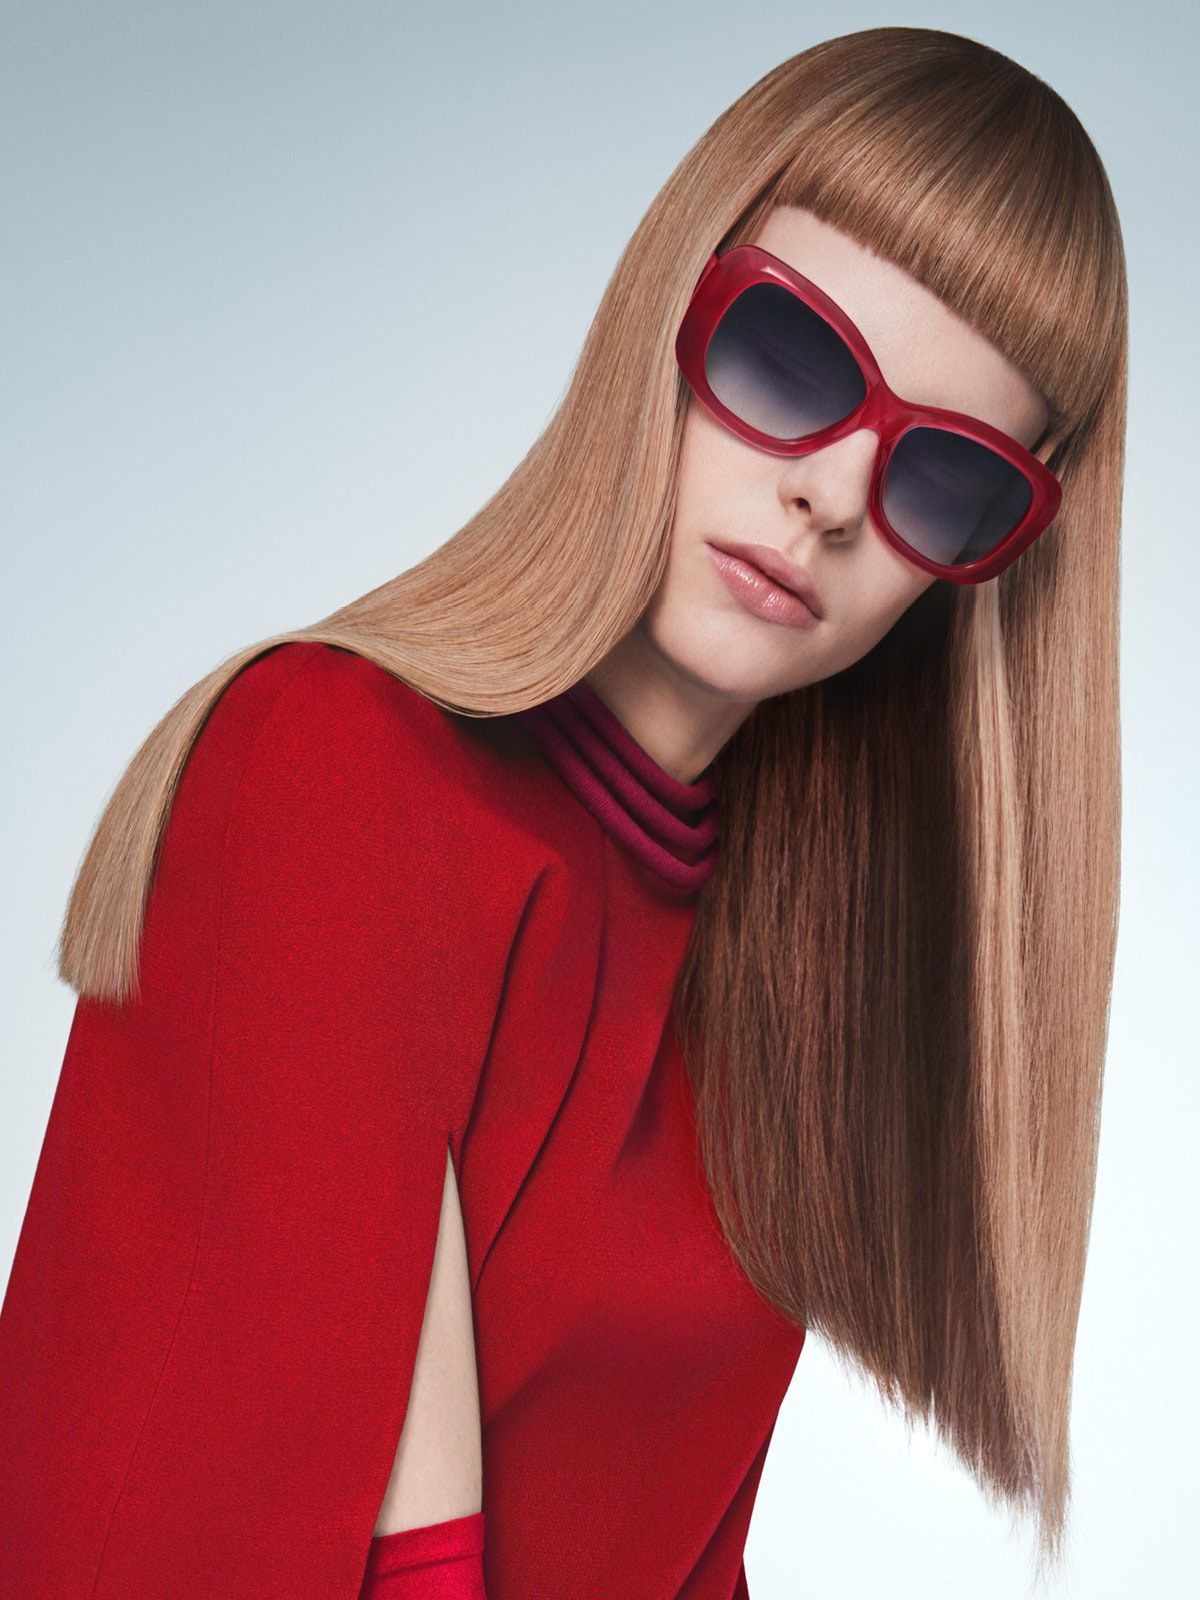 Collectionxmondaineg пикс hair style